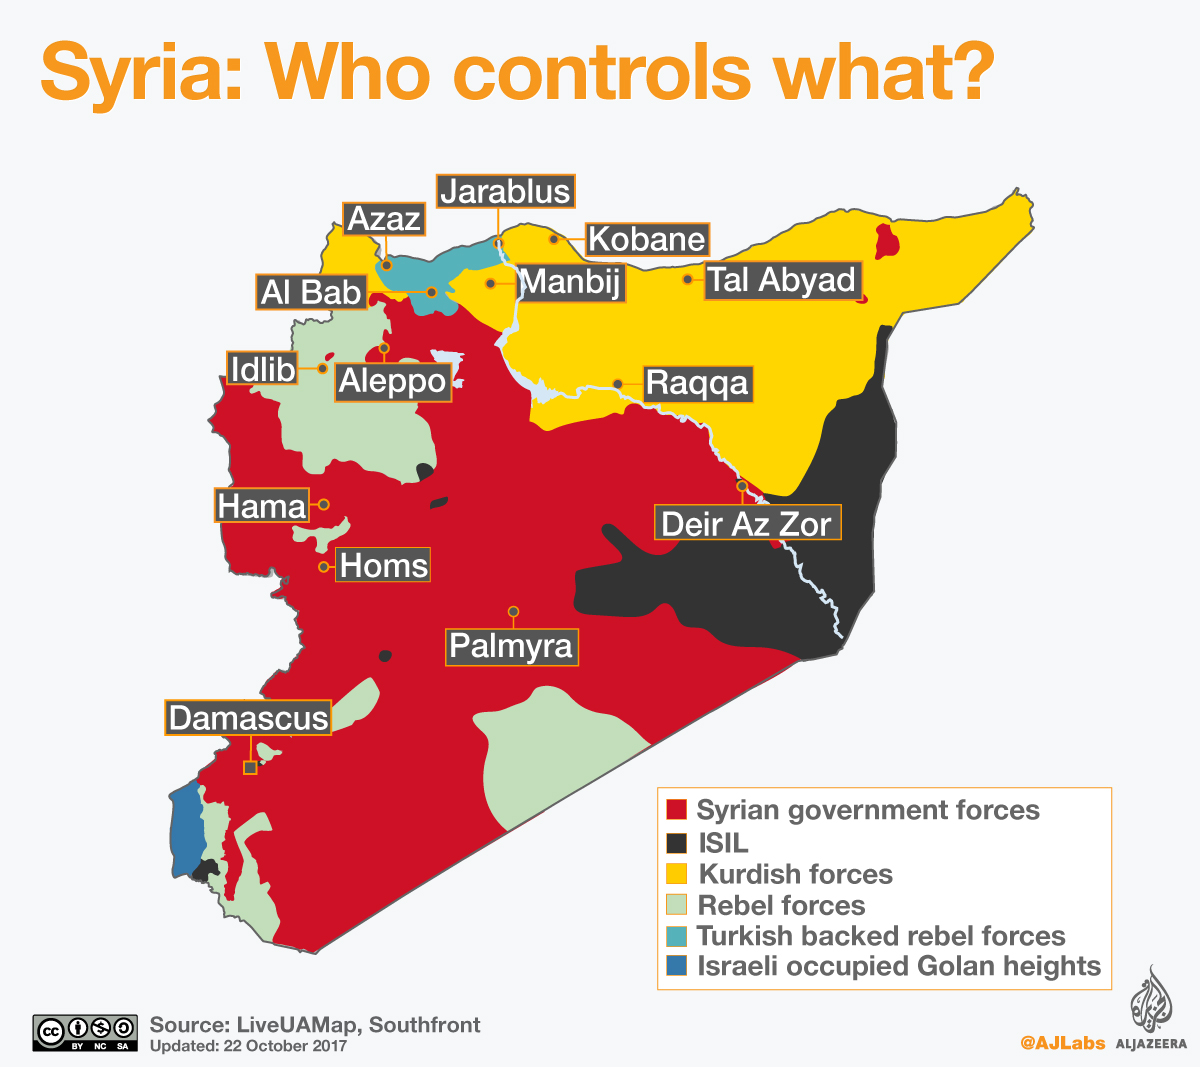 Turkeys operation in Syrias Afrin The key players News Al Jazeera